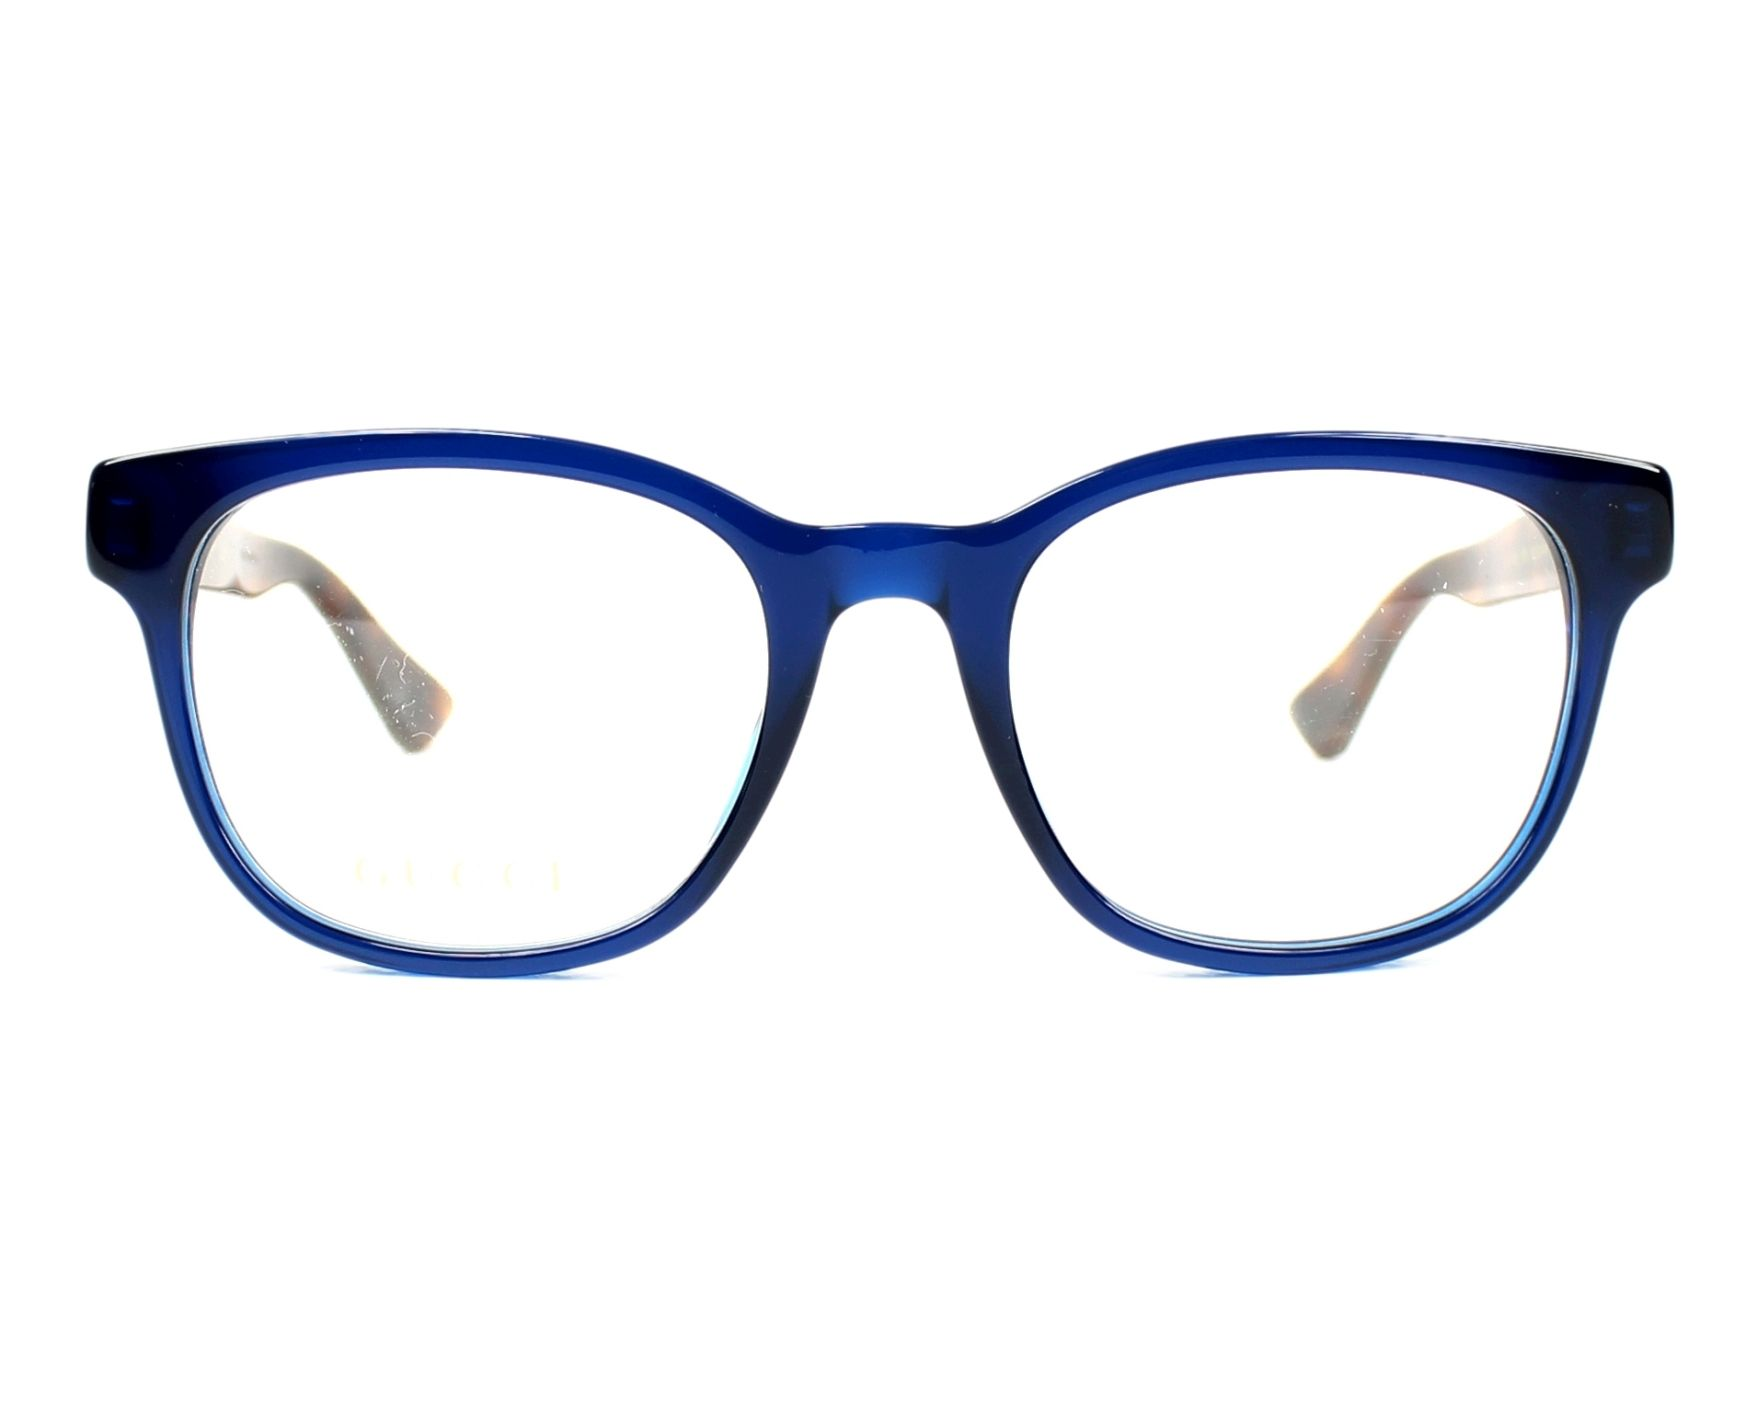 new authentic gucci eyeglasses frames gg0005o 008 ebay